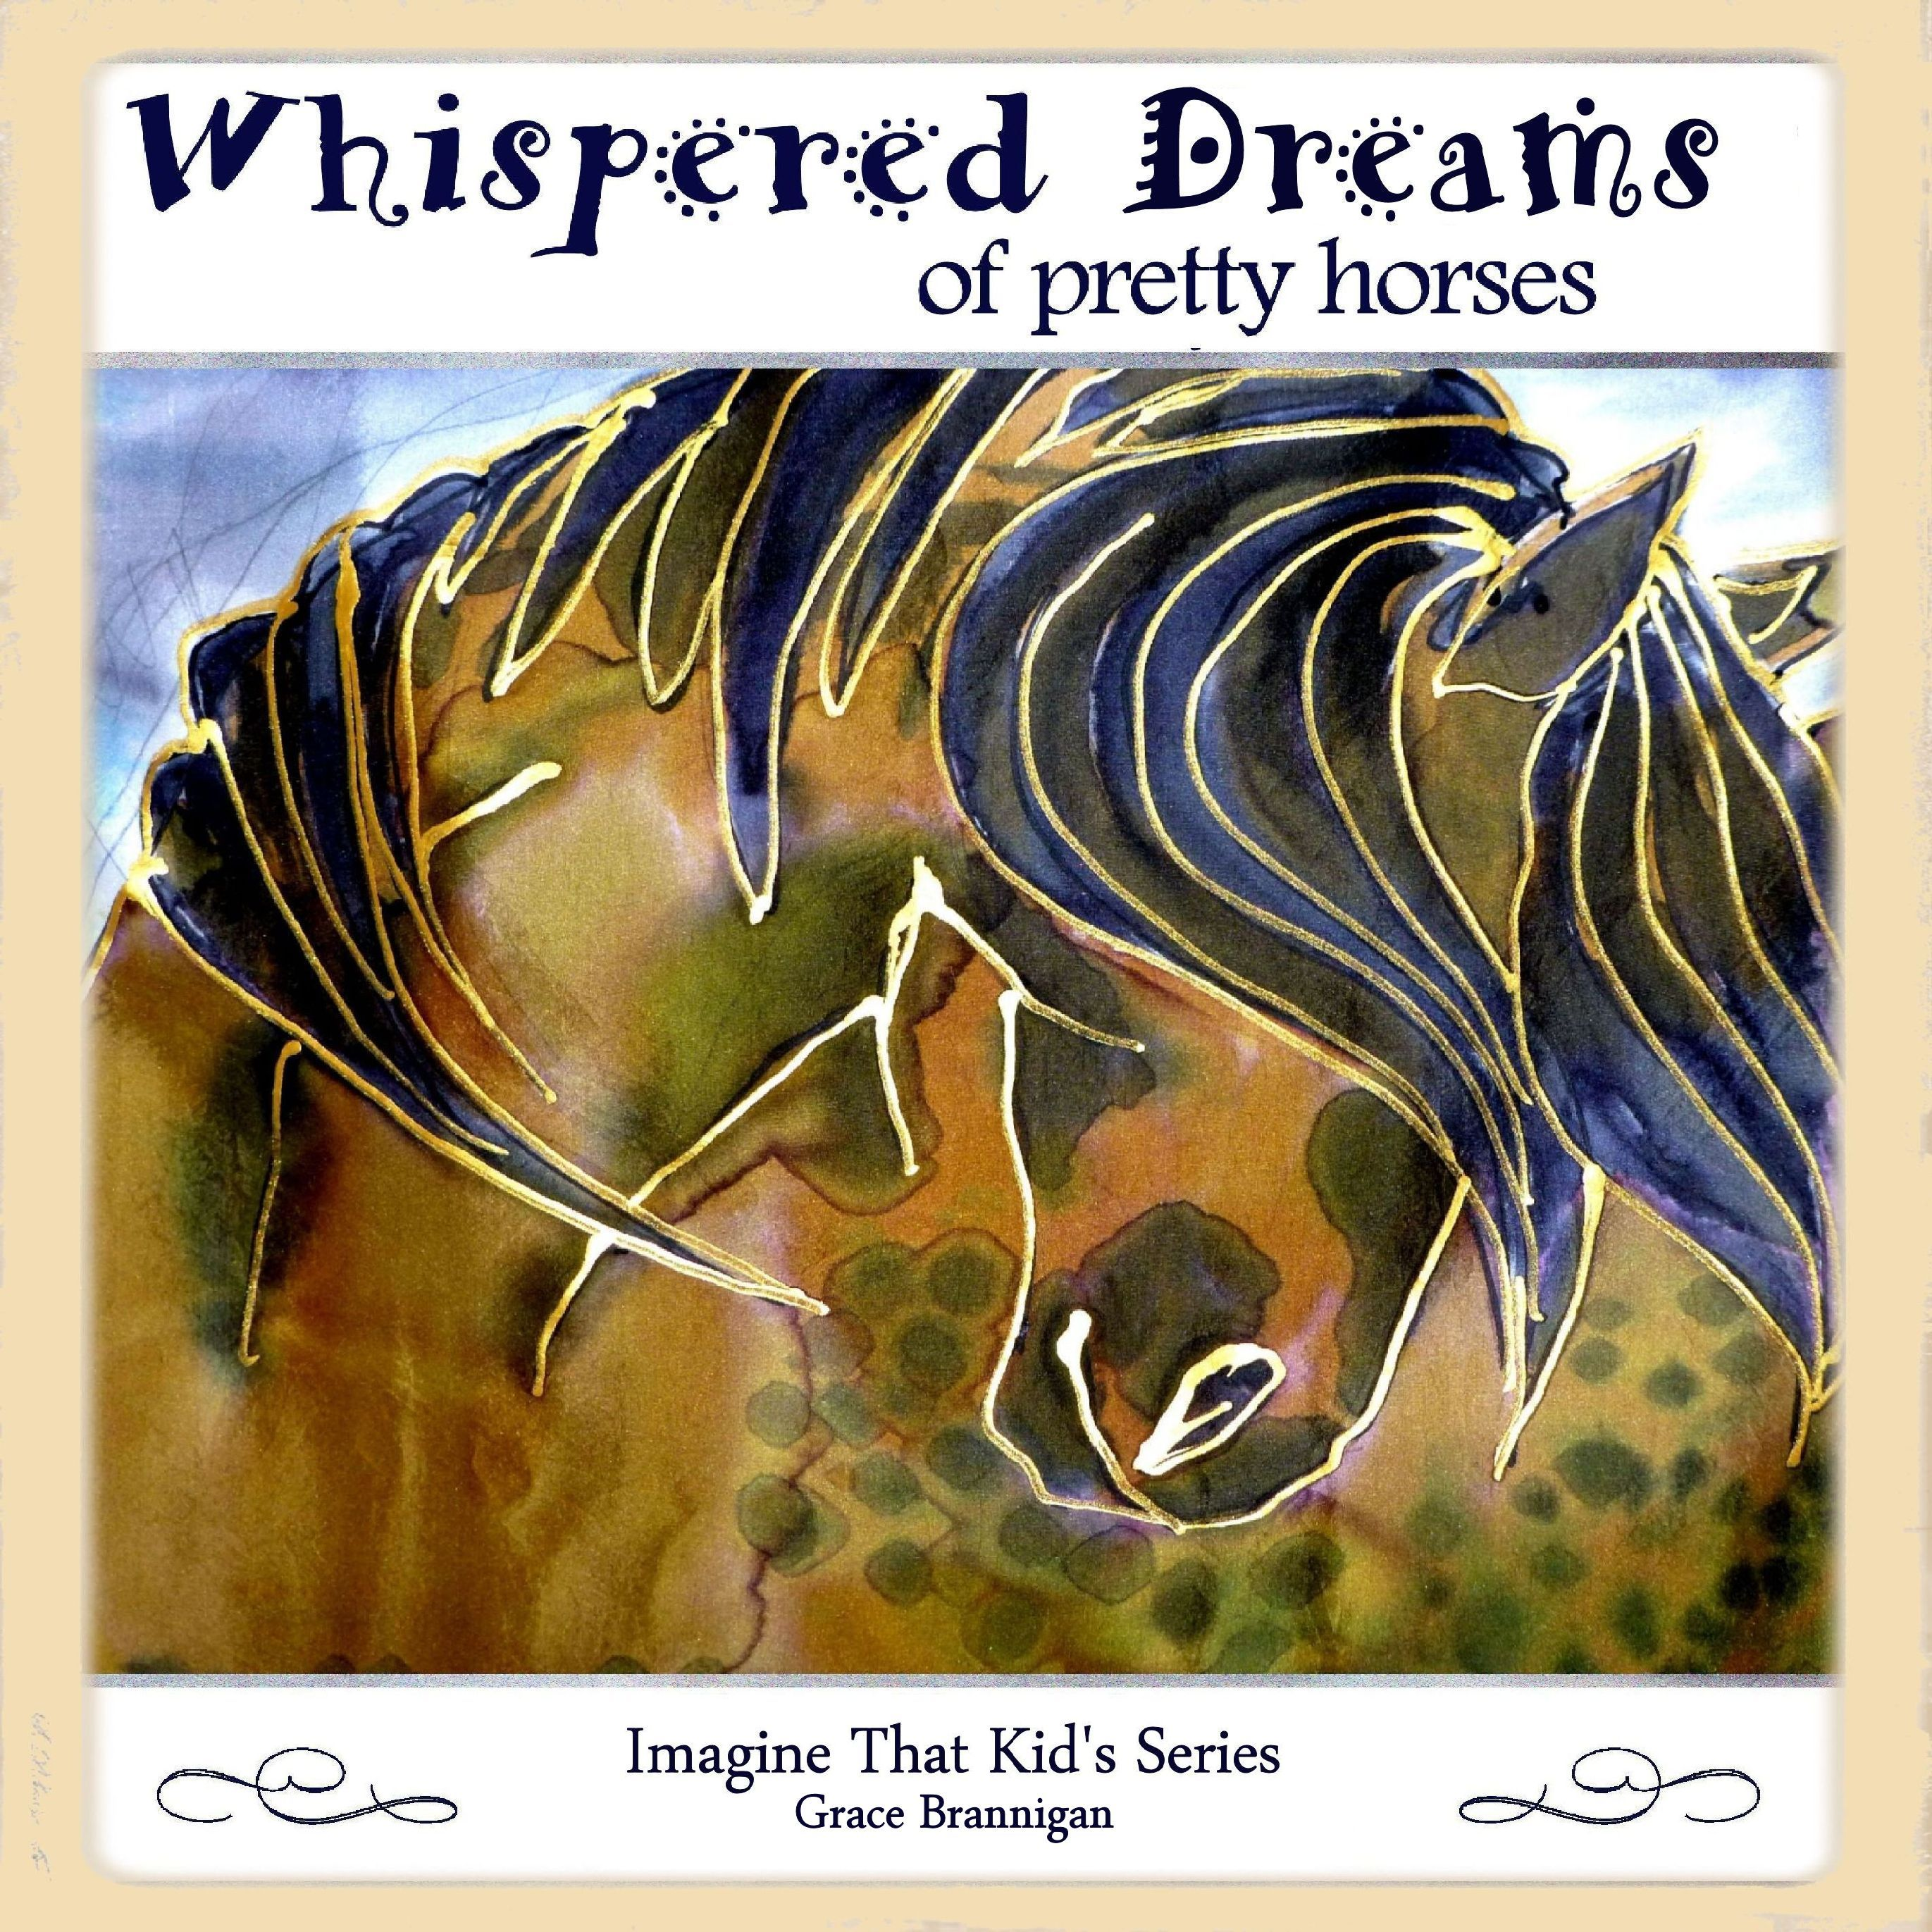 Whispered Dreams of Pretty Horses